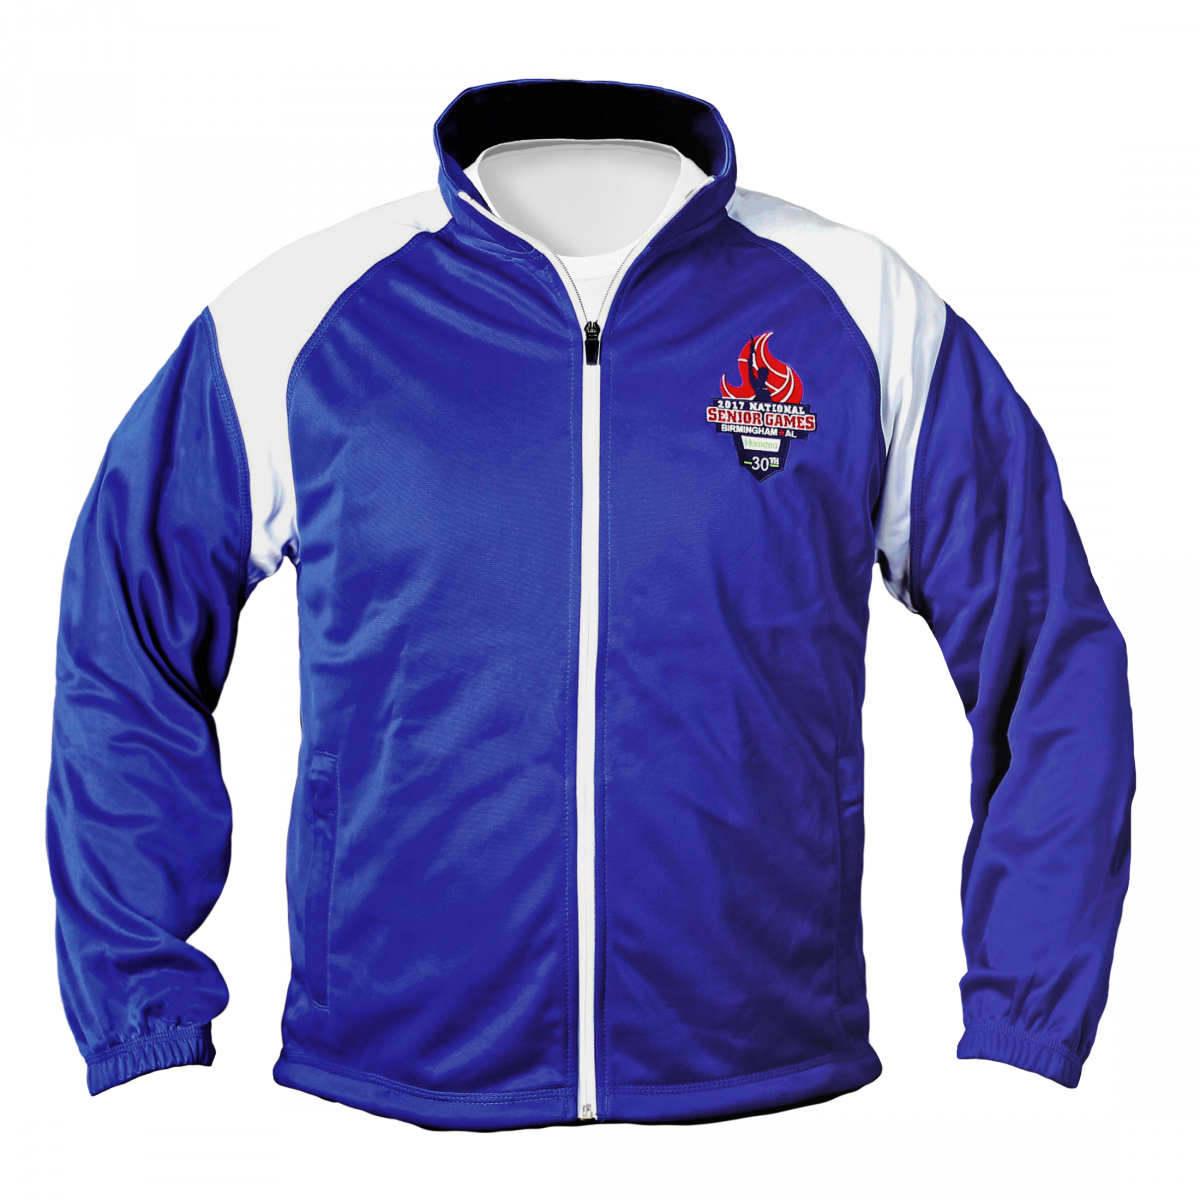 NSGA Embroidered Jacket